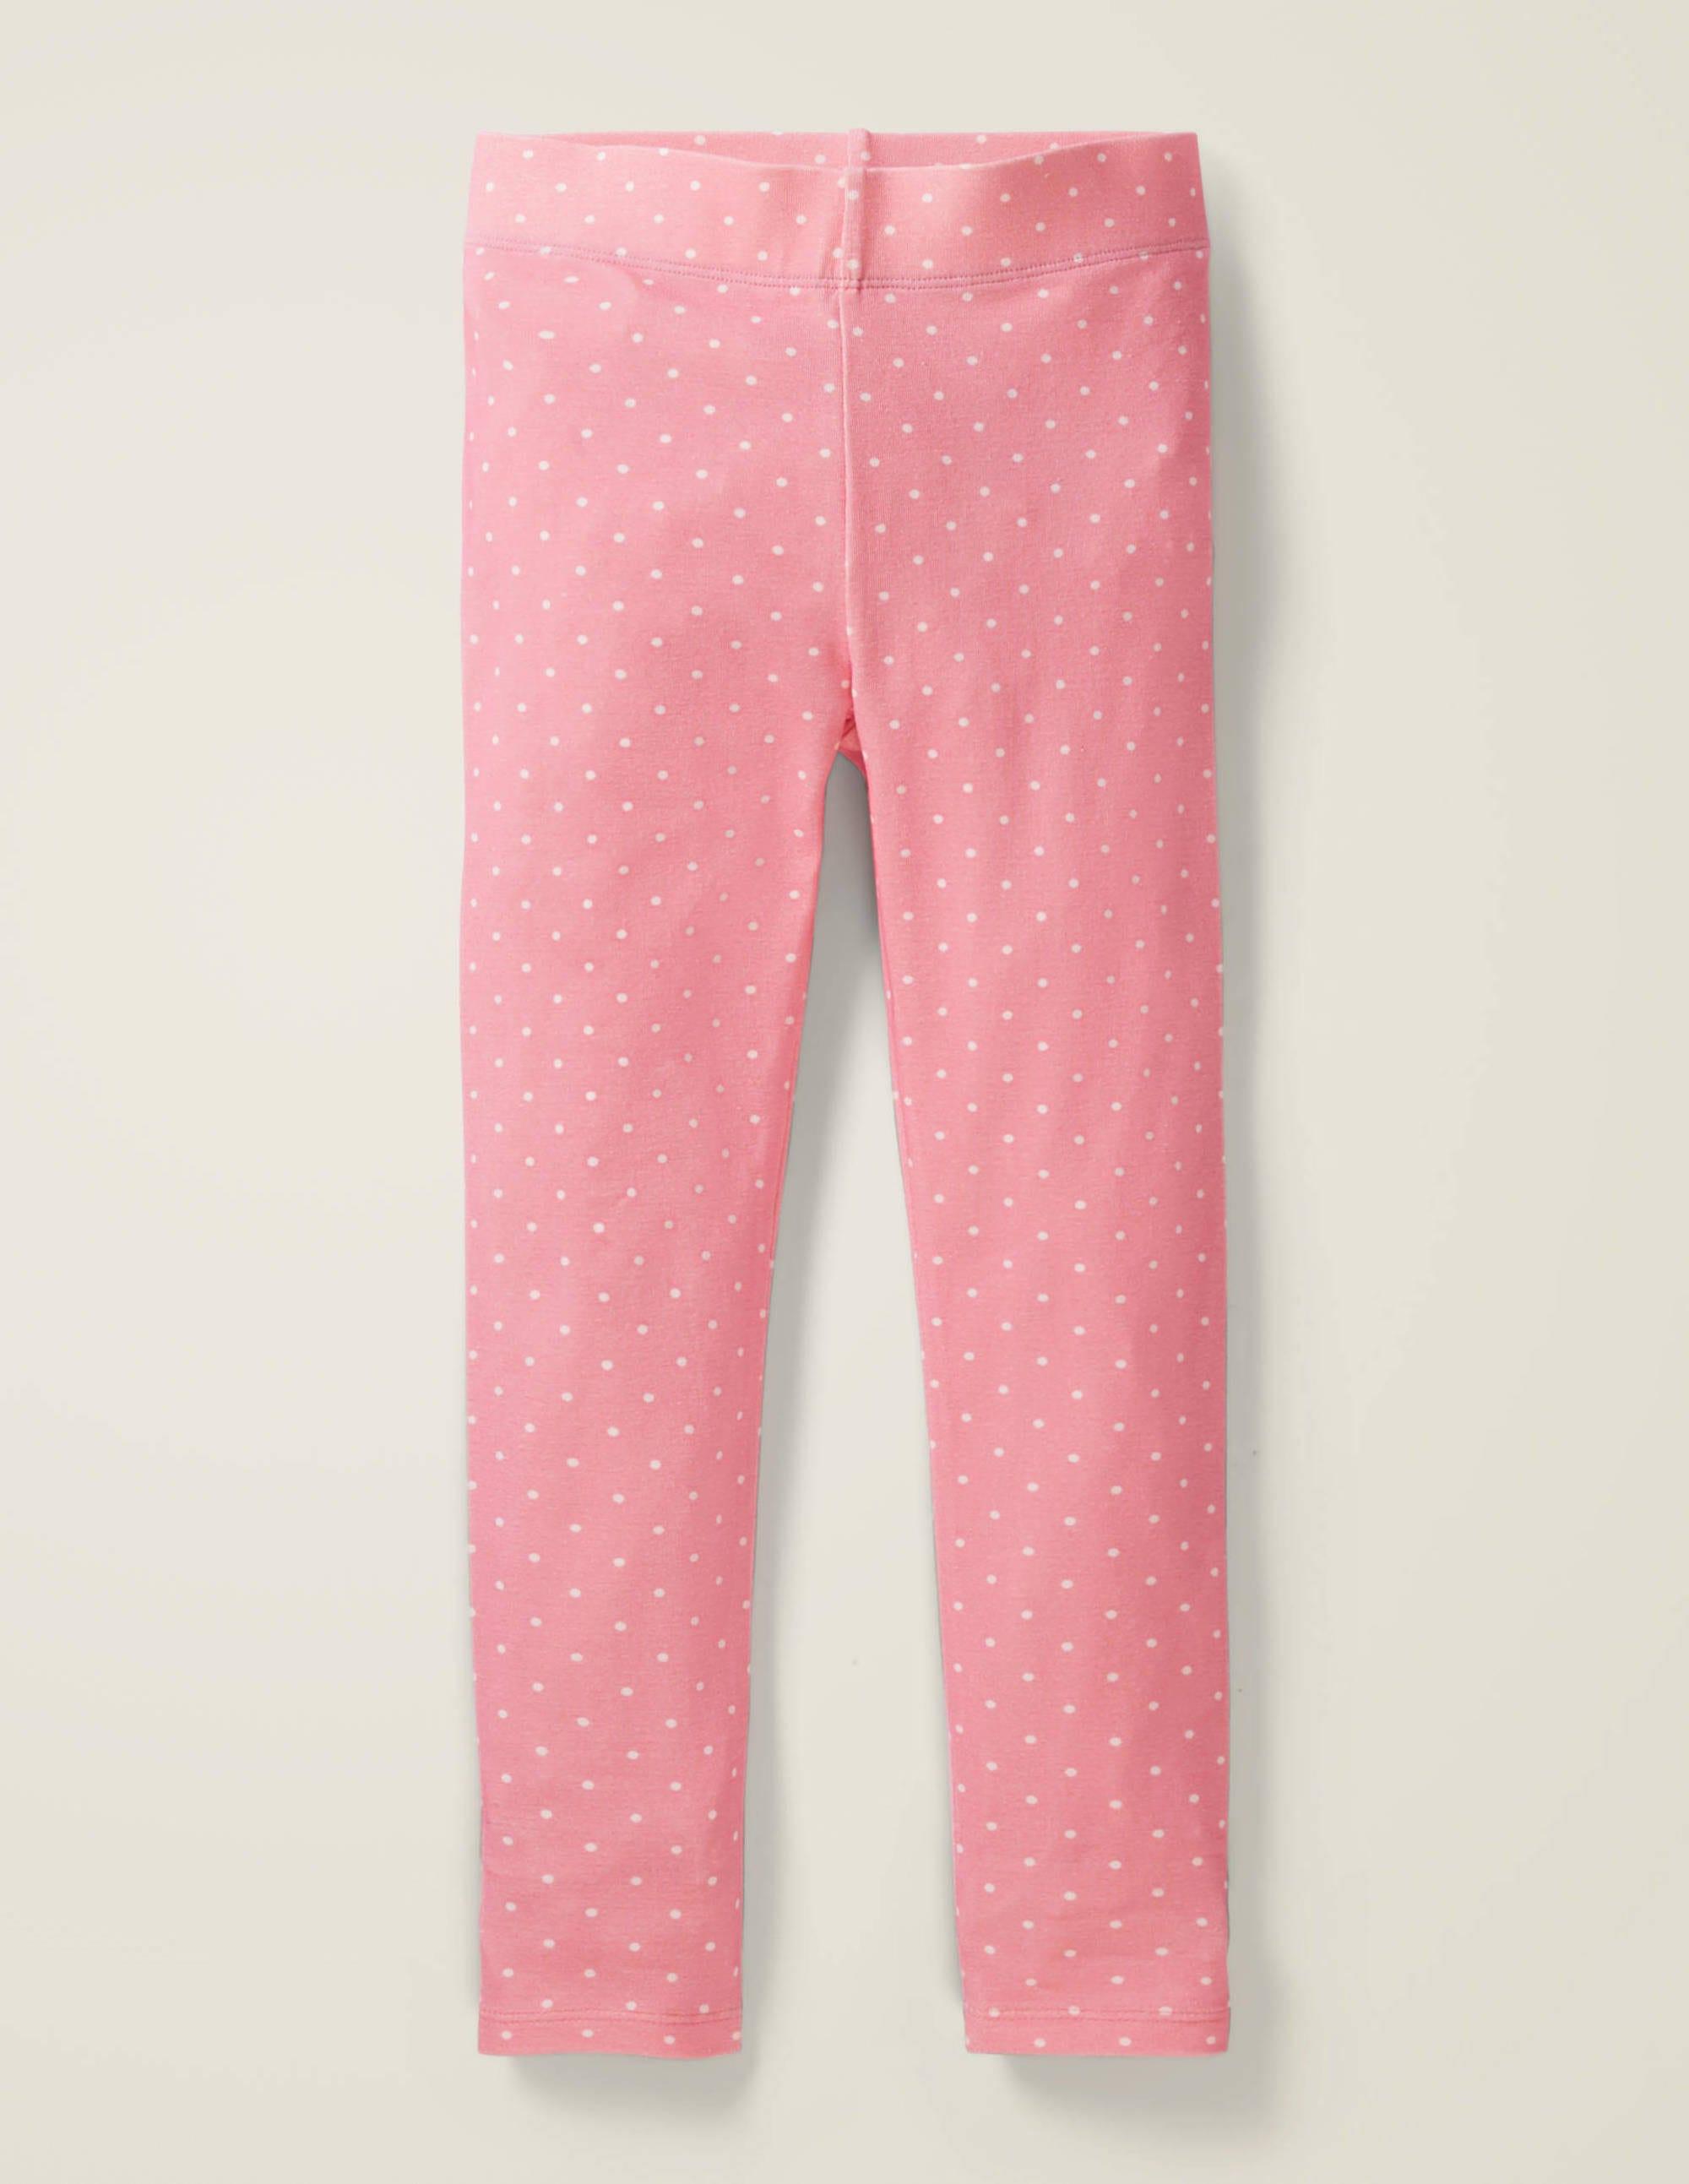 Legging fun PNK Femme Boden, Pink